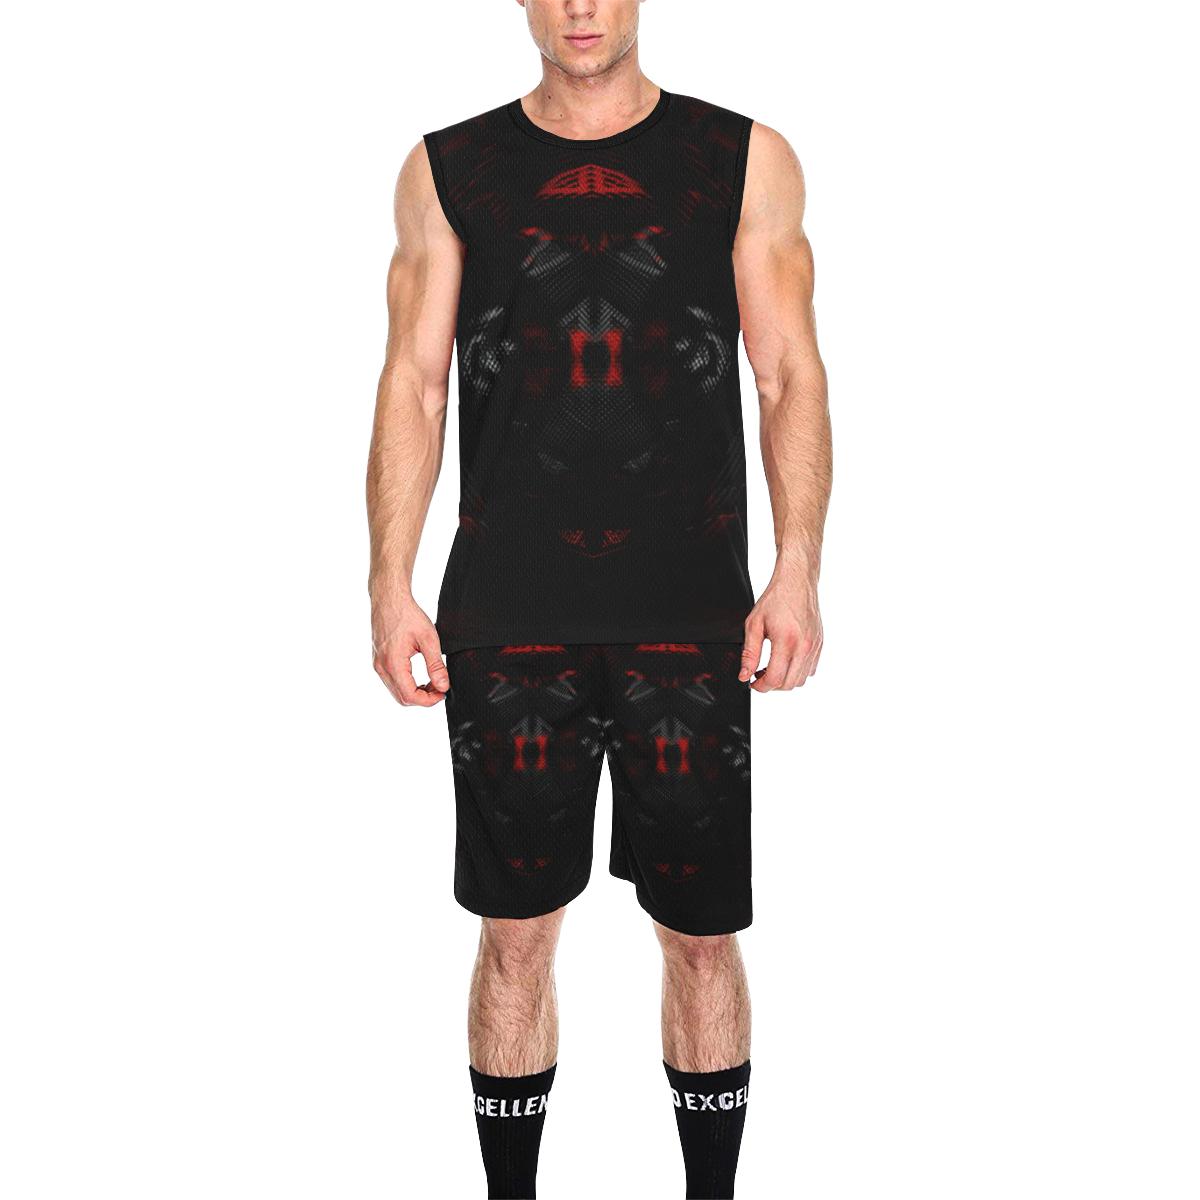 5000DUBLE 5 All Over Print Basketball Uniform